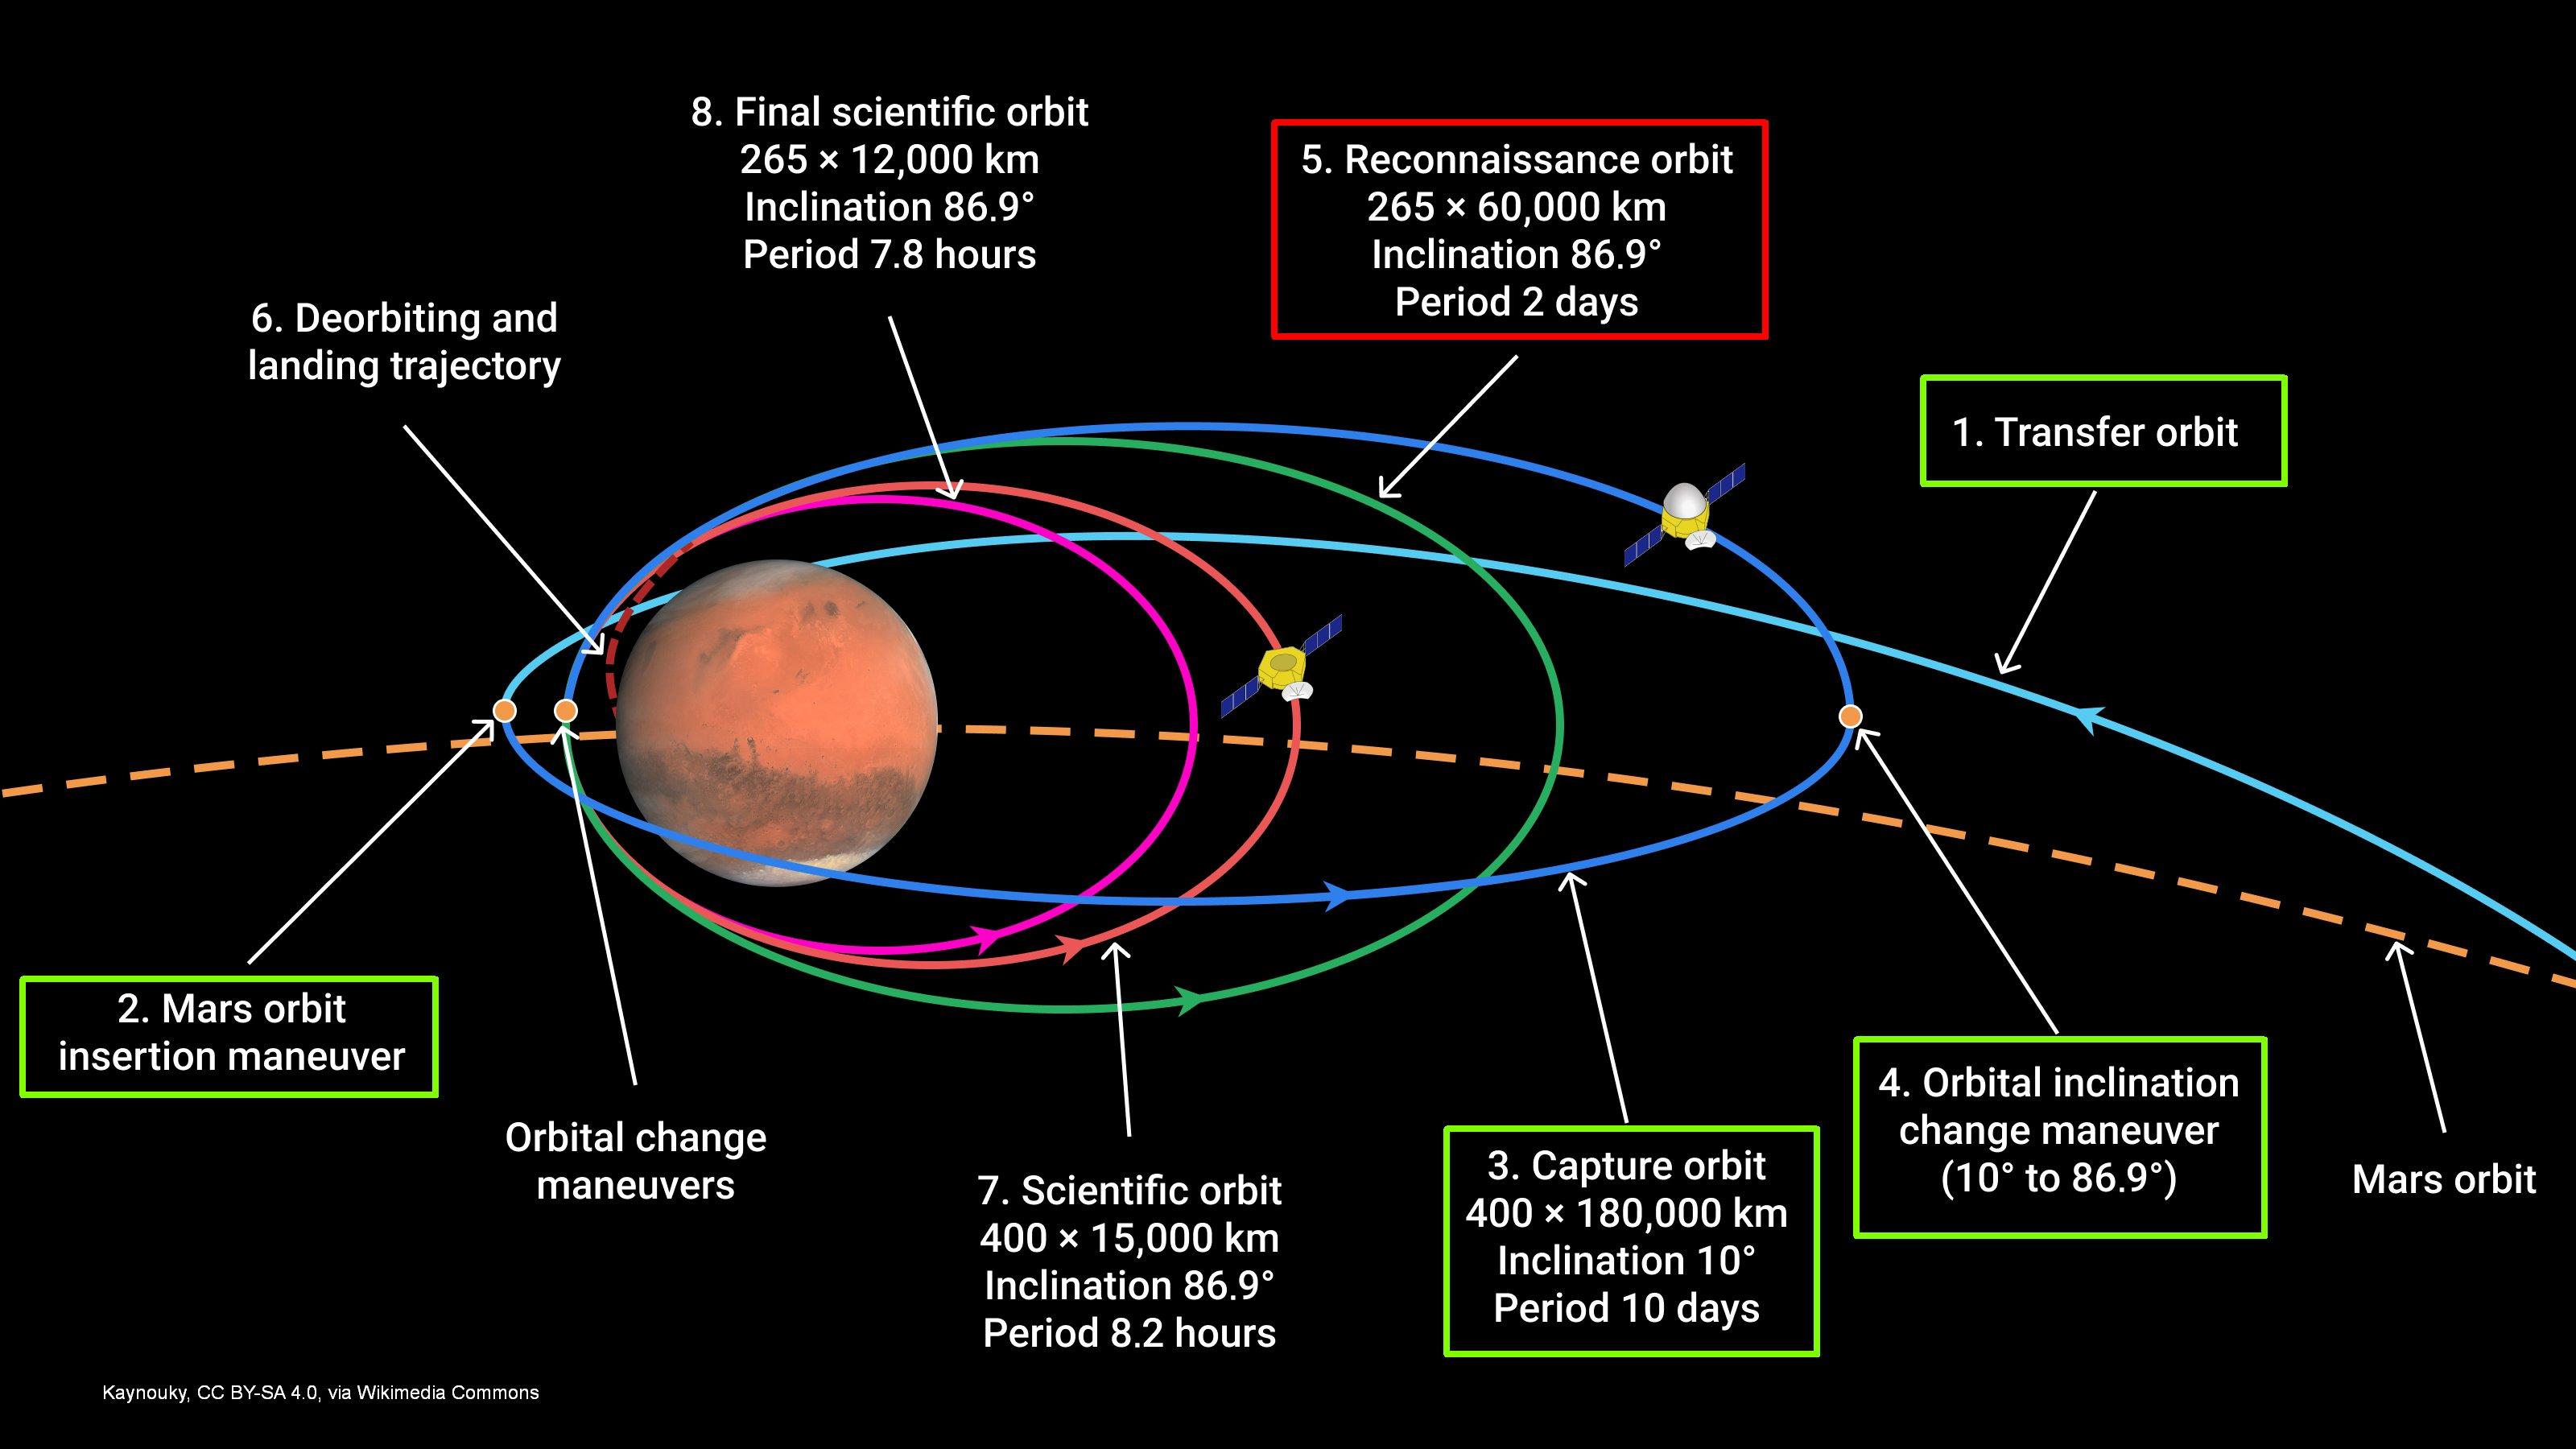 [Chine] Mission Tianwen-1 (orbiteur + atterrisseur + rover) - Page 4 EuqbEQZWYAItsai?format=jpg&name=4096x4096